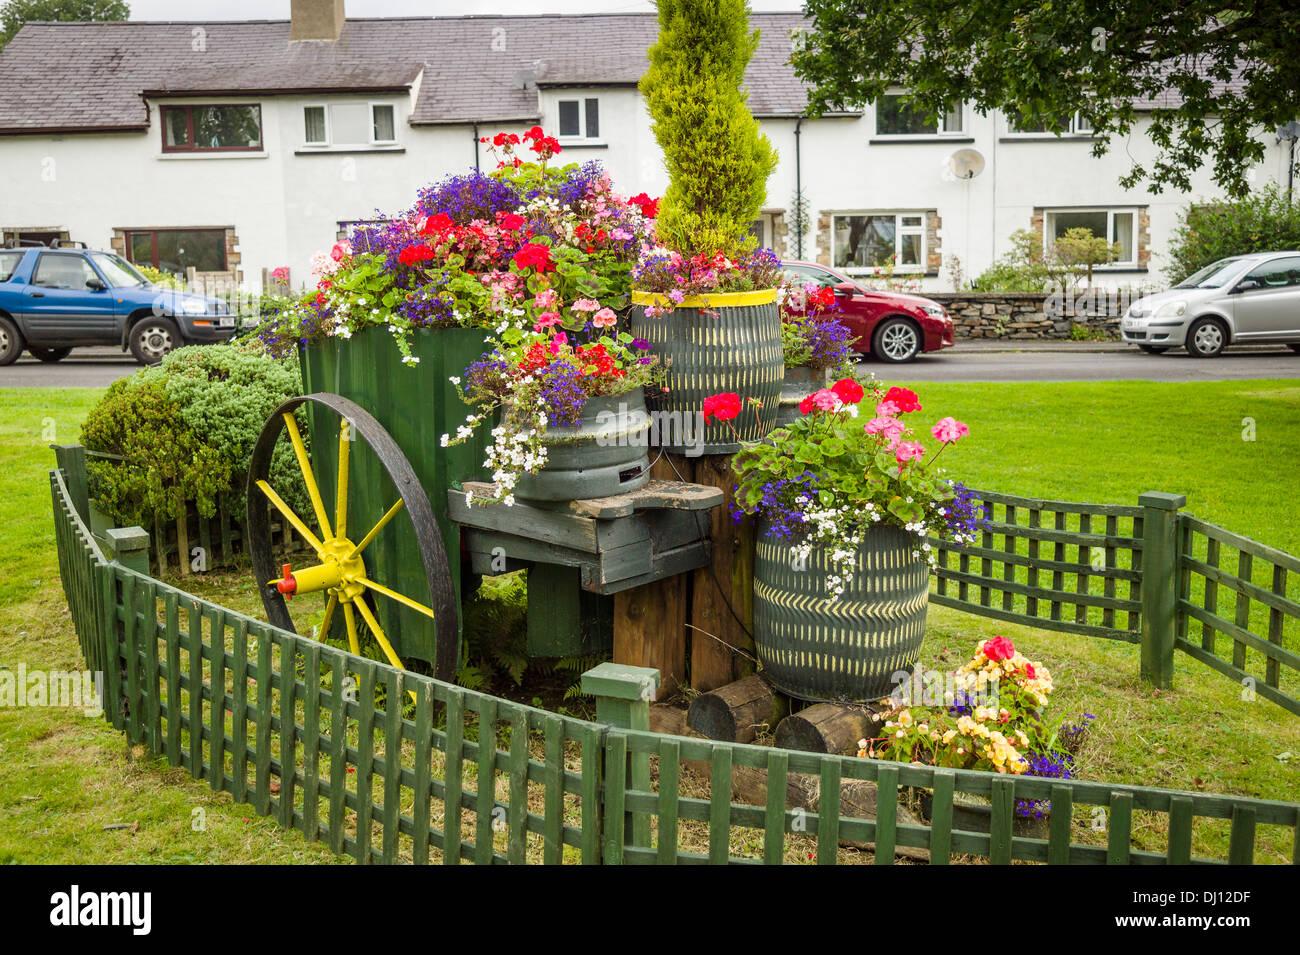 Unusual floral garden in village of Beddgelert Snowdonia North Wales UK - Stock Image